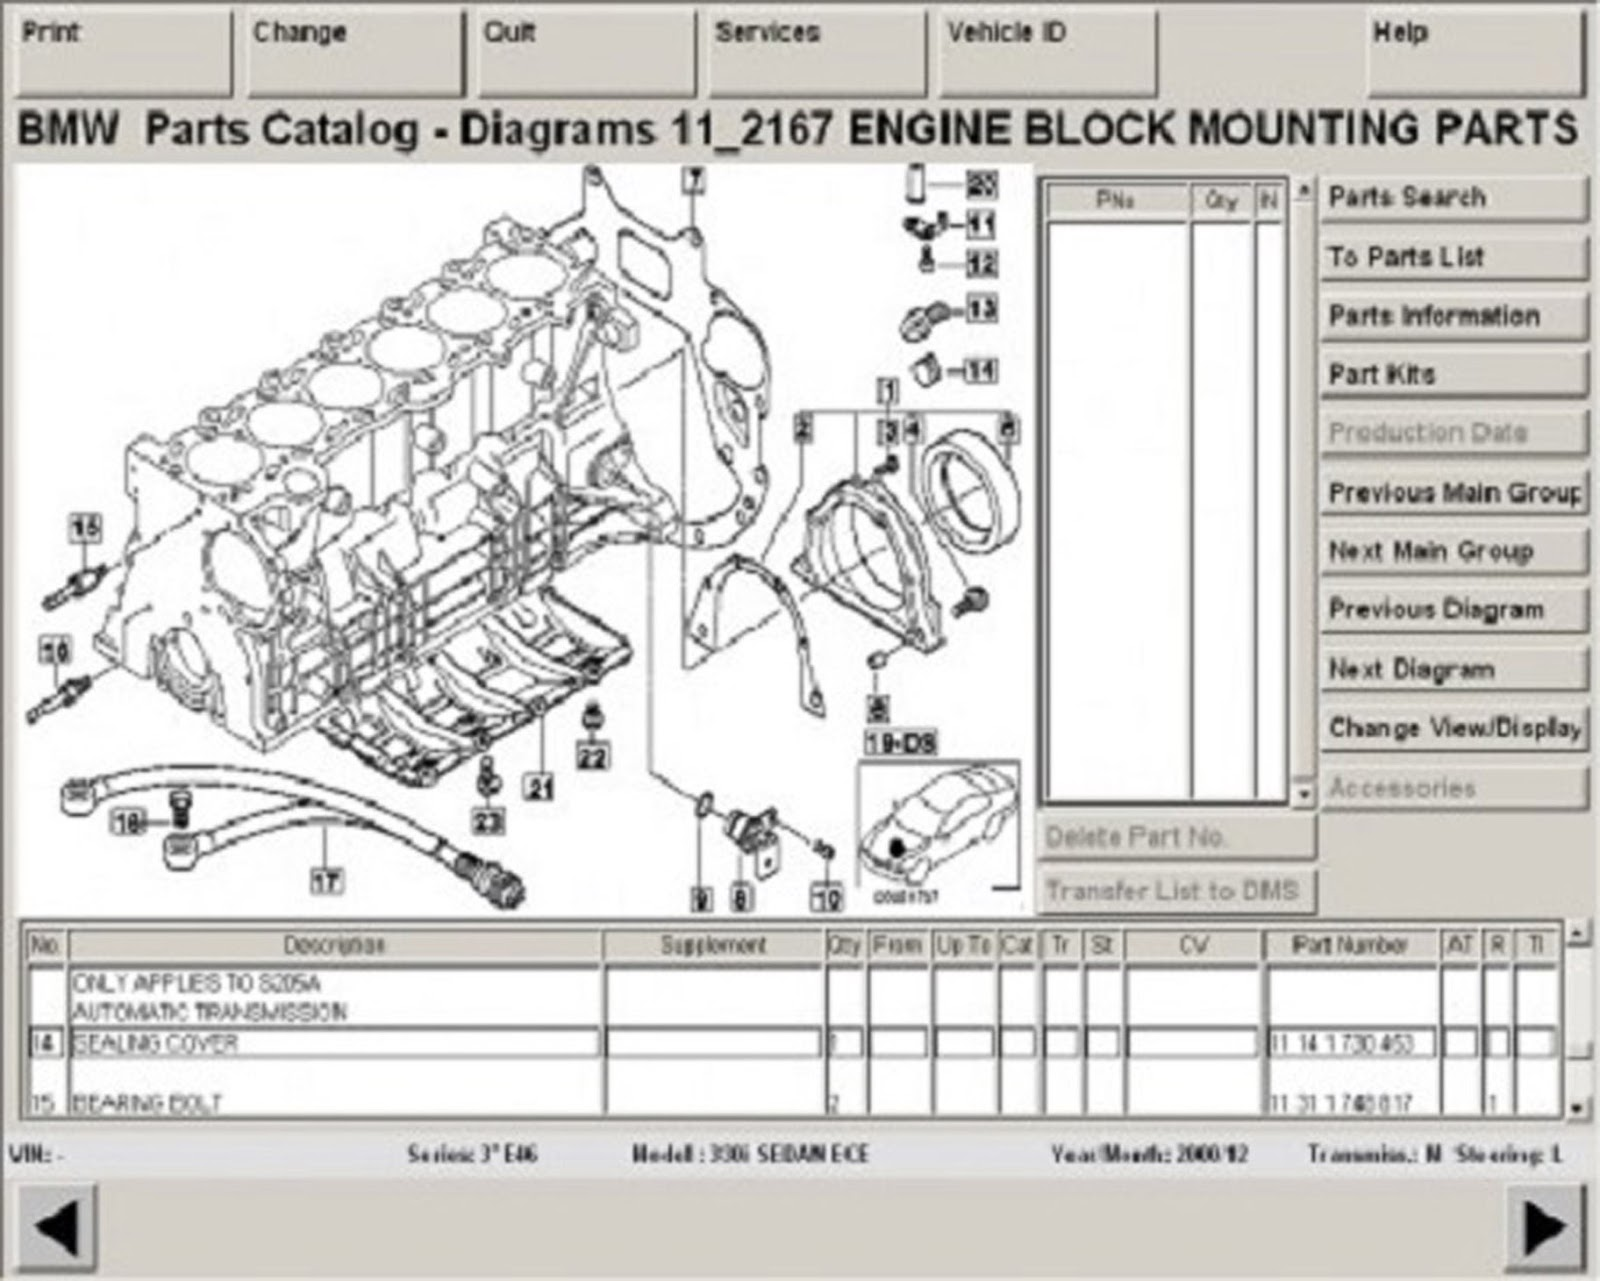 small resolution of bmw workshop service repair manuals tis wds epc etk etm obd2 jombang electrical wiring diagram